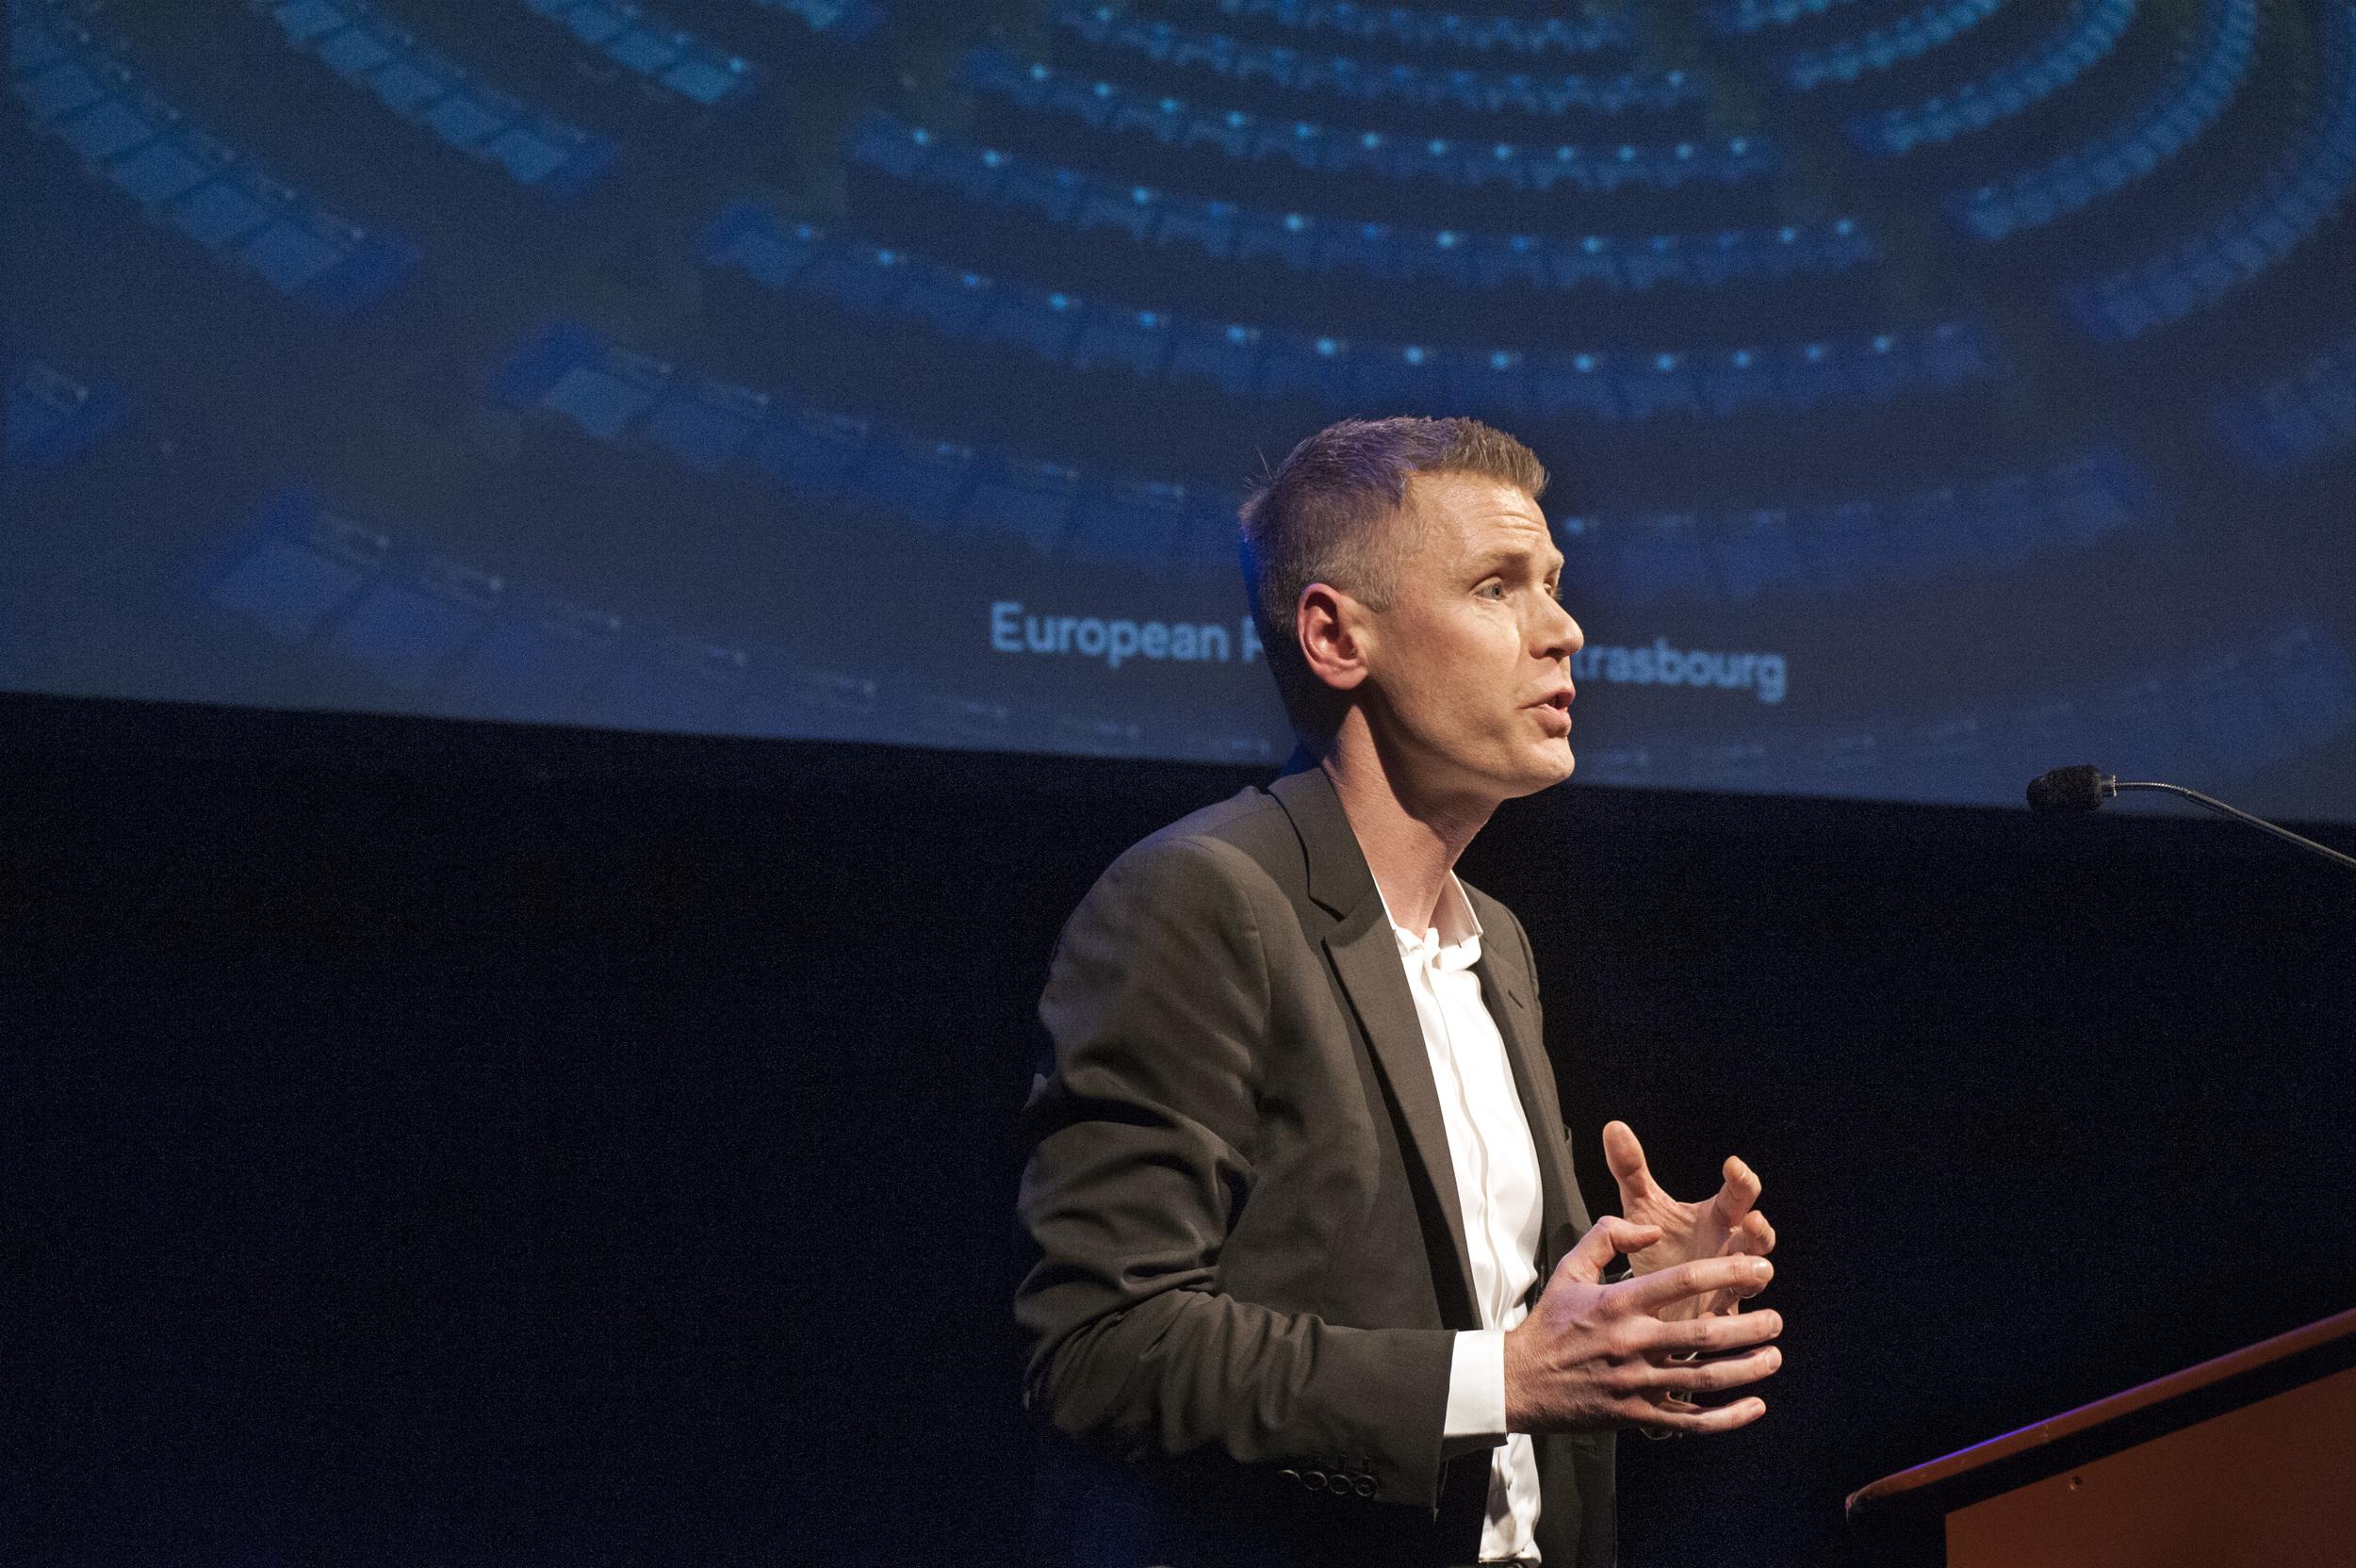 Keynote speaker Philippe Legrain ©Jan Boeve